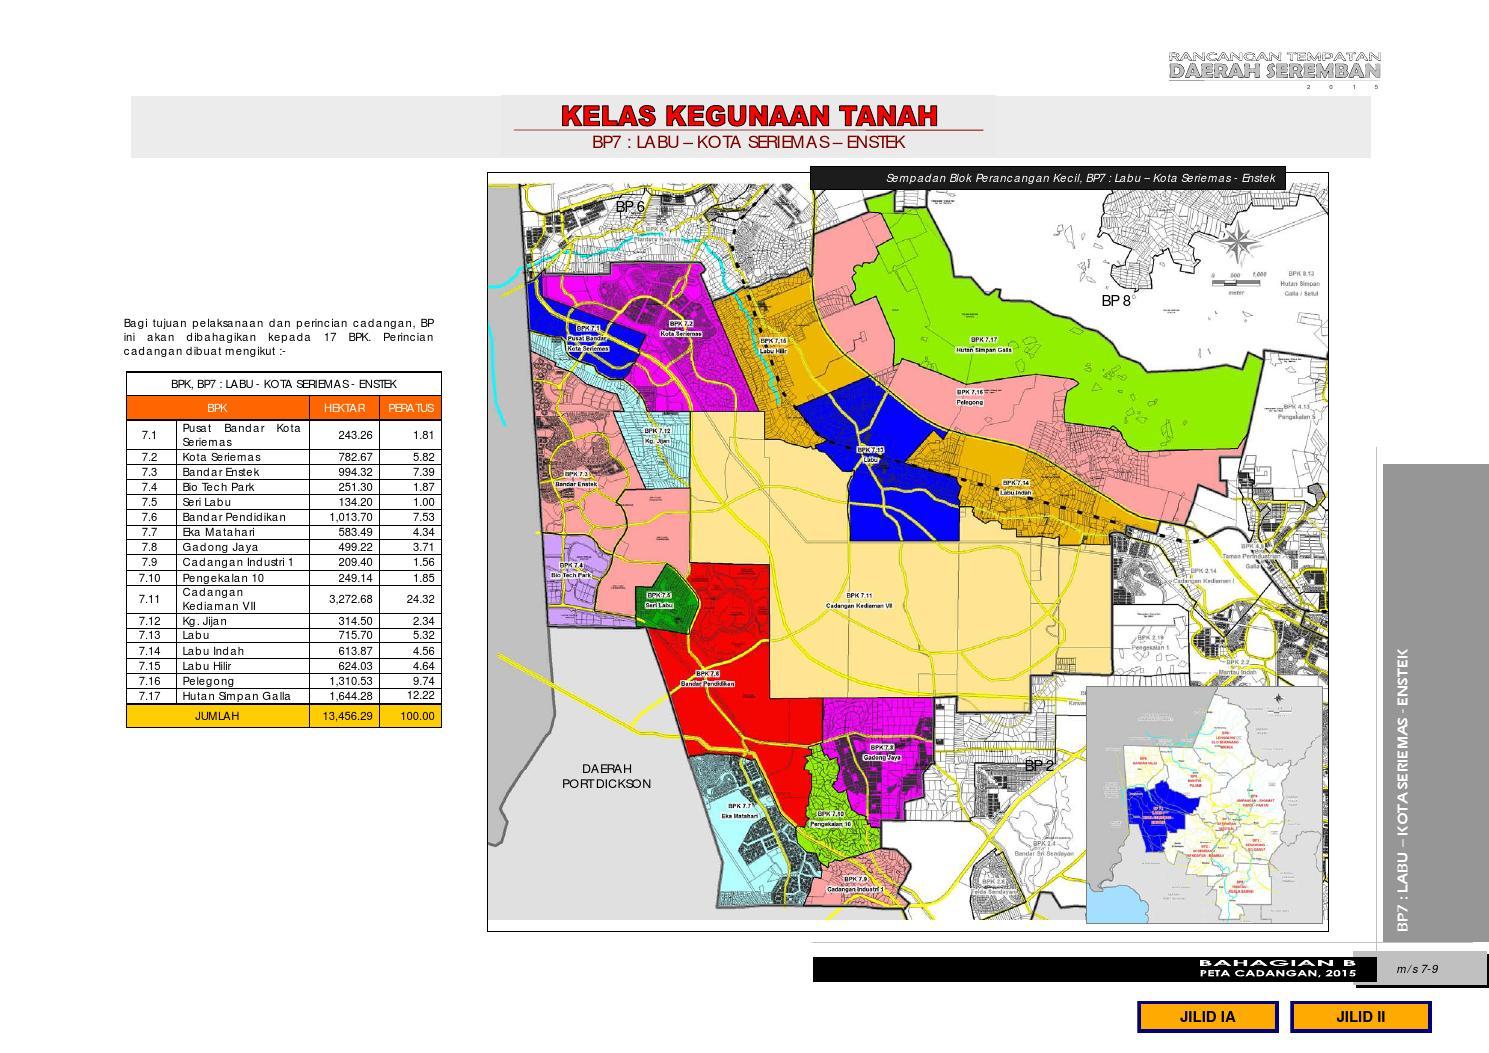 Rancangan tempatan daerah seremban 2015 by uppjpbd issuu ccuart Gallery